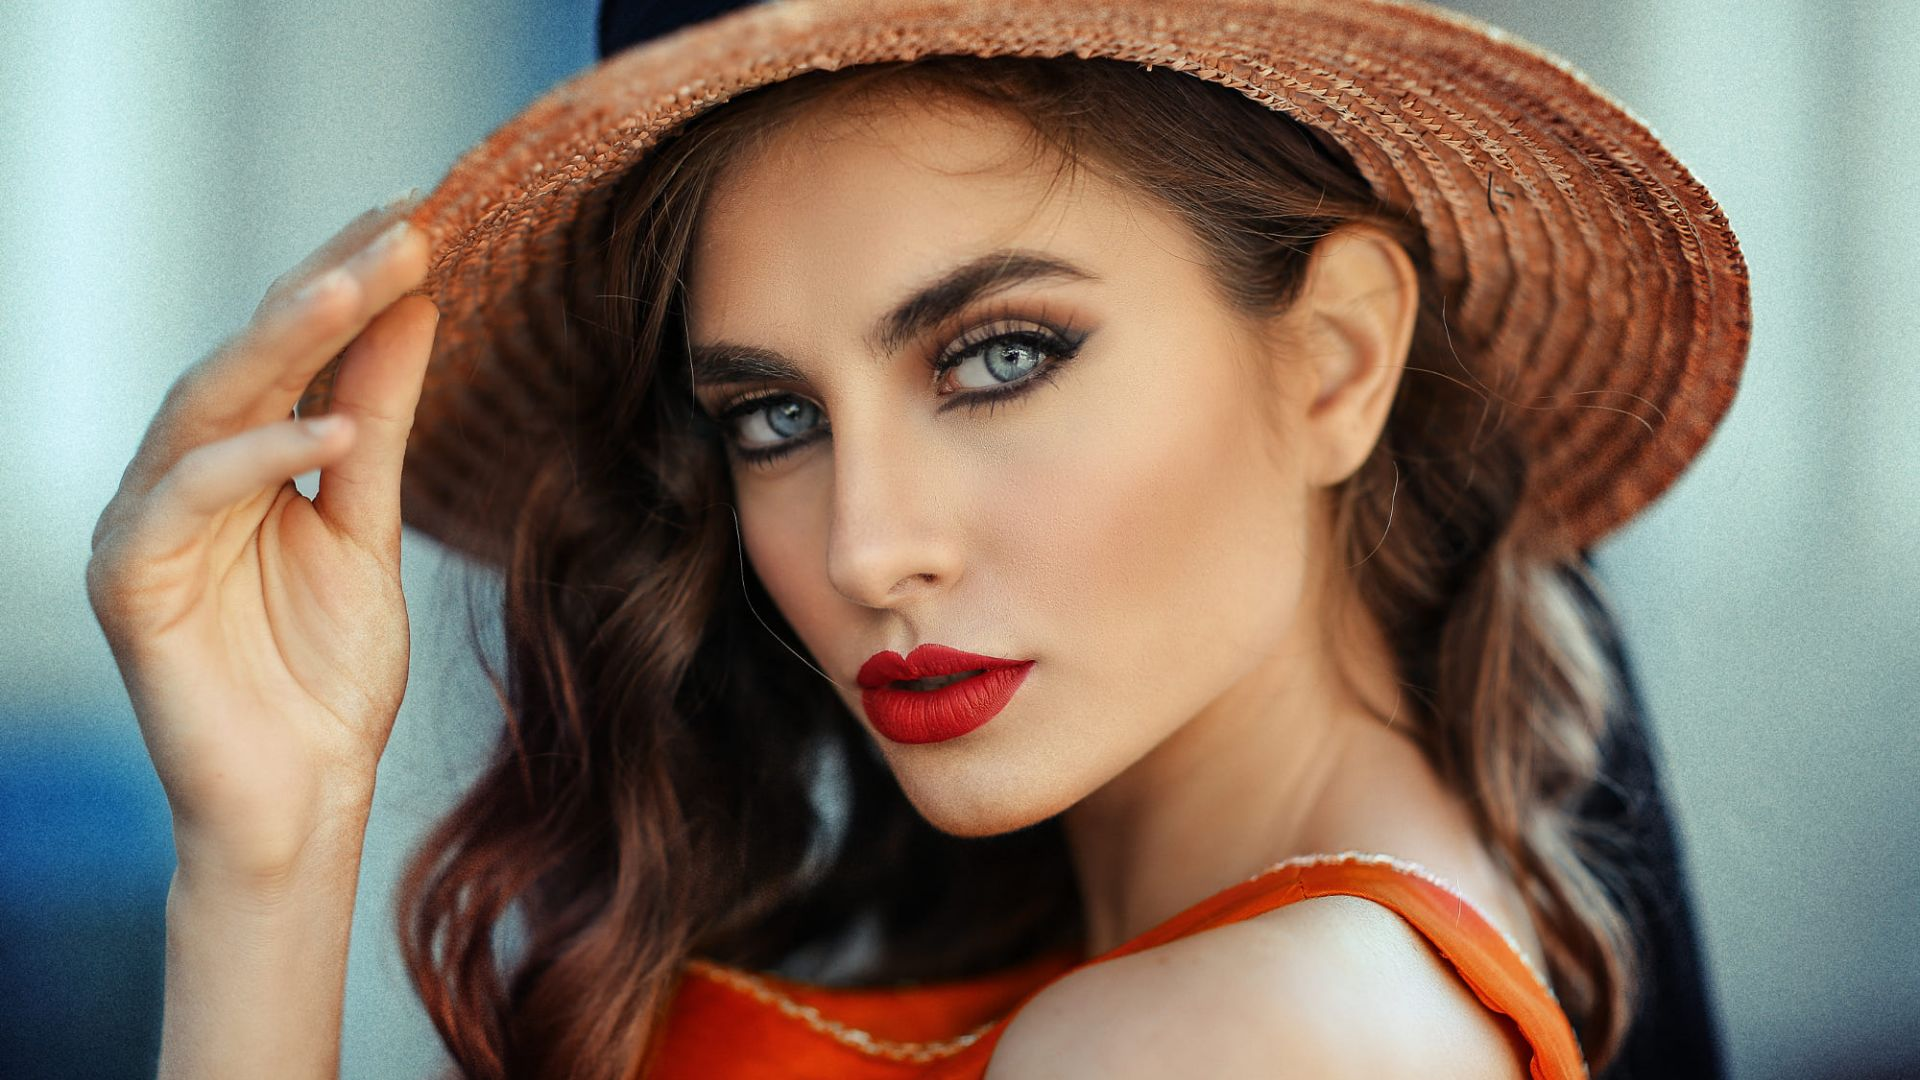 Wallpaper Red juicy lips, hat, face, girl model